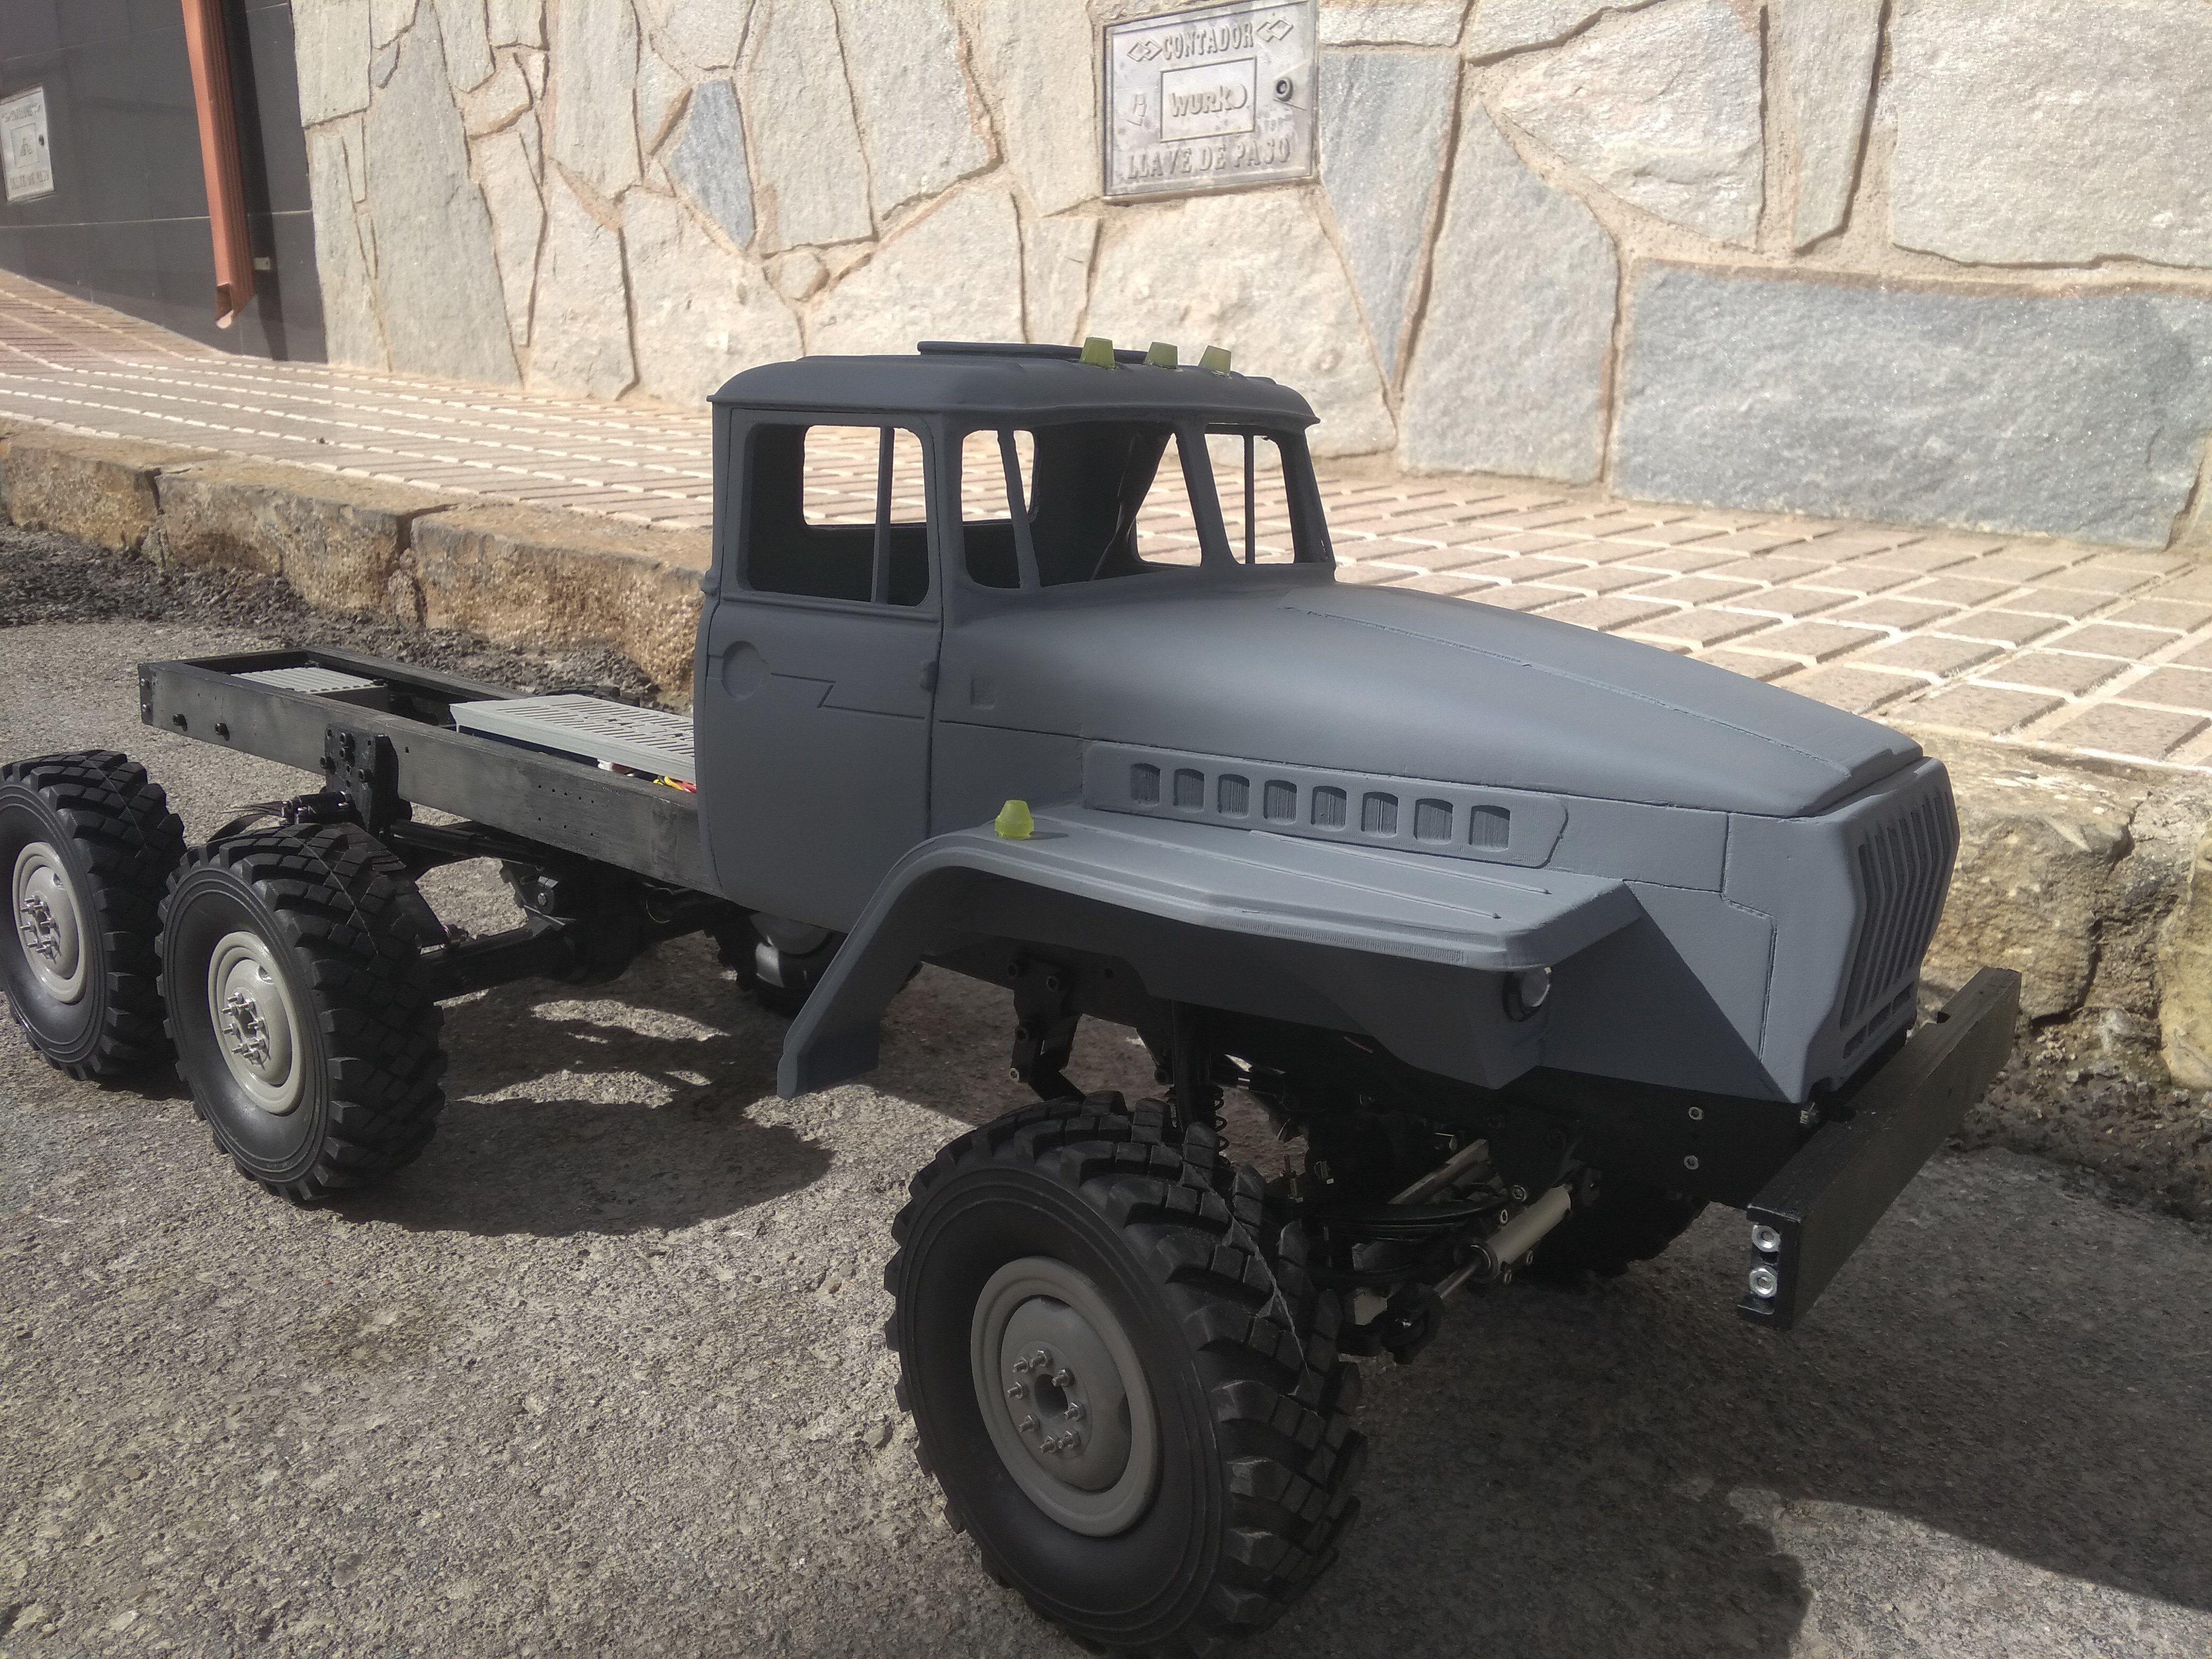 Crawler chasis 6x6 Ural rc truck